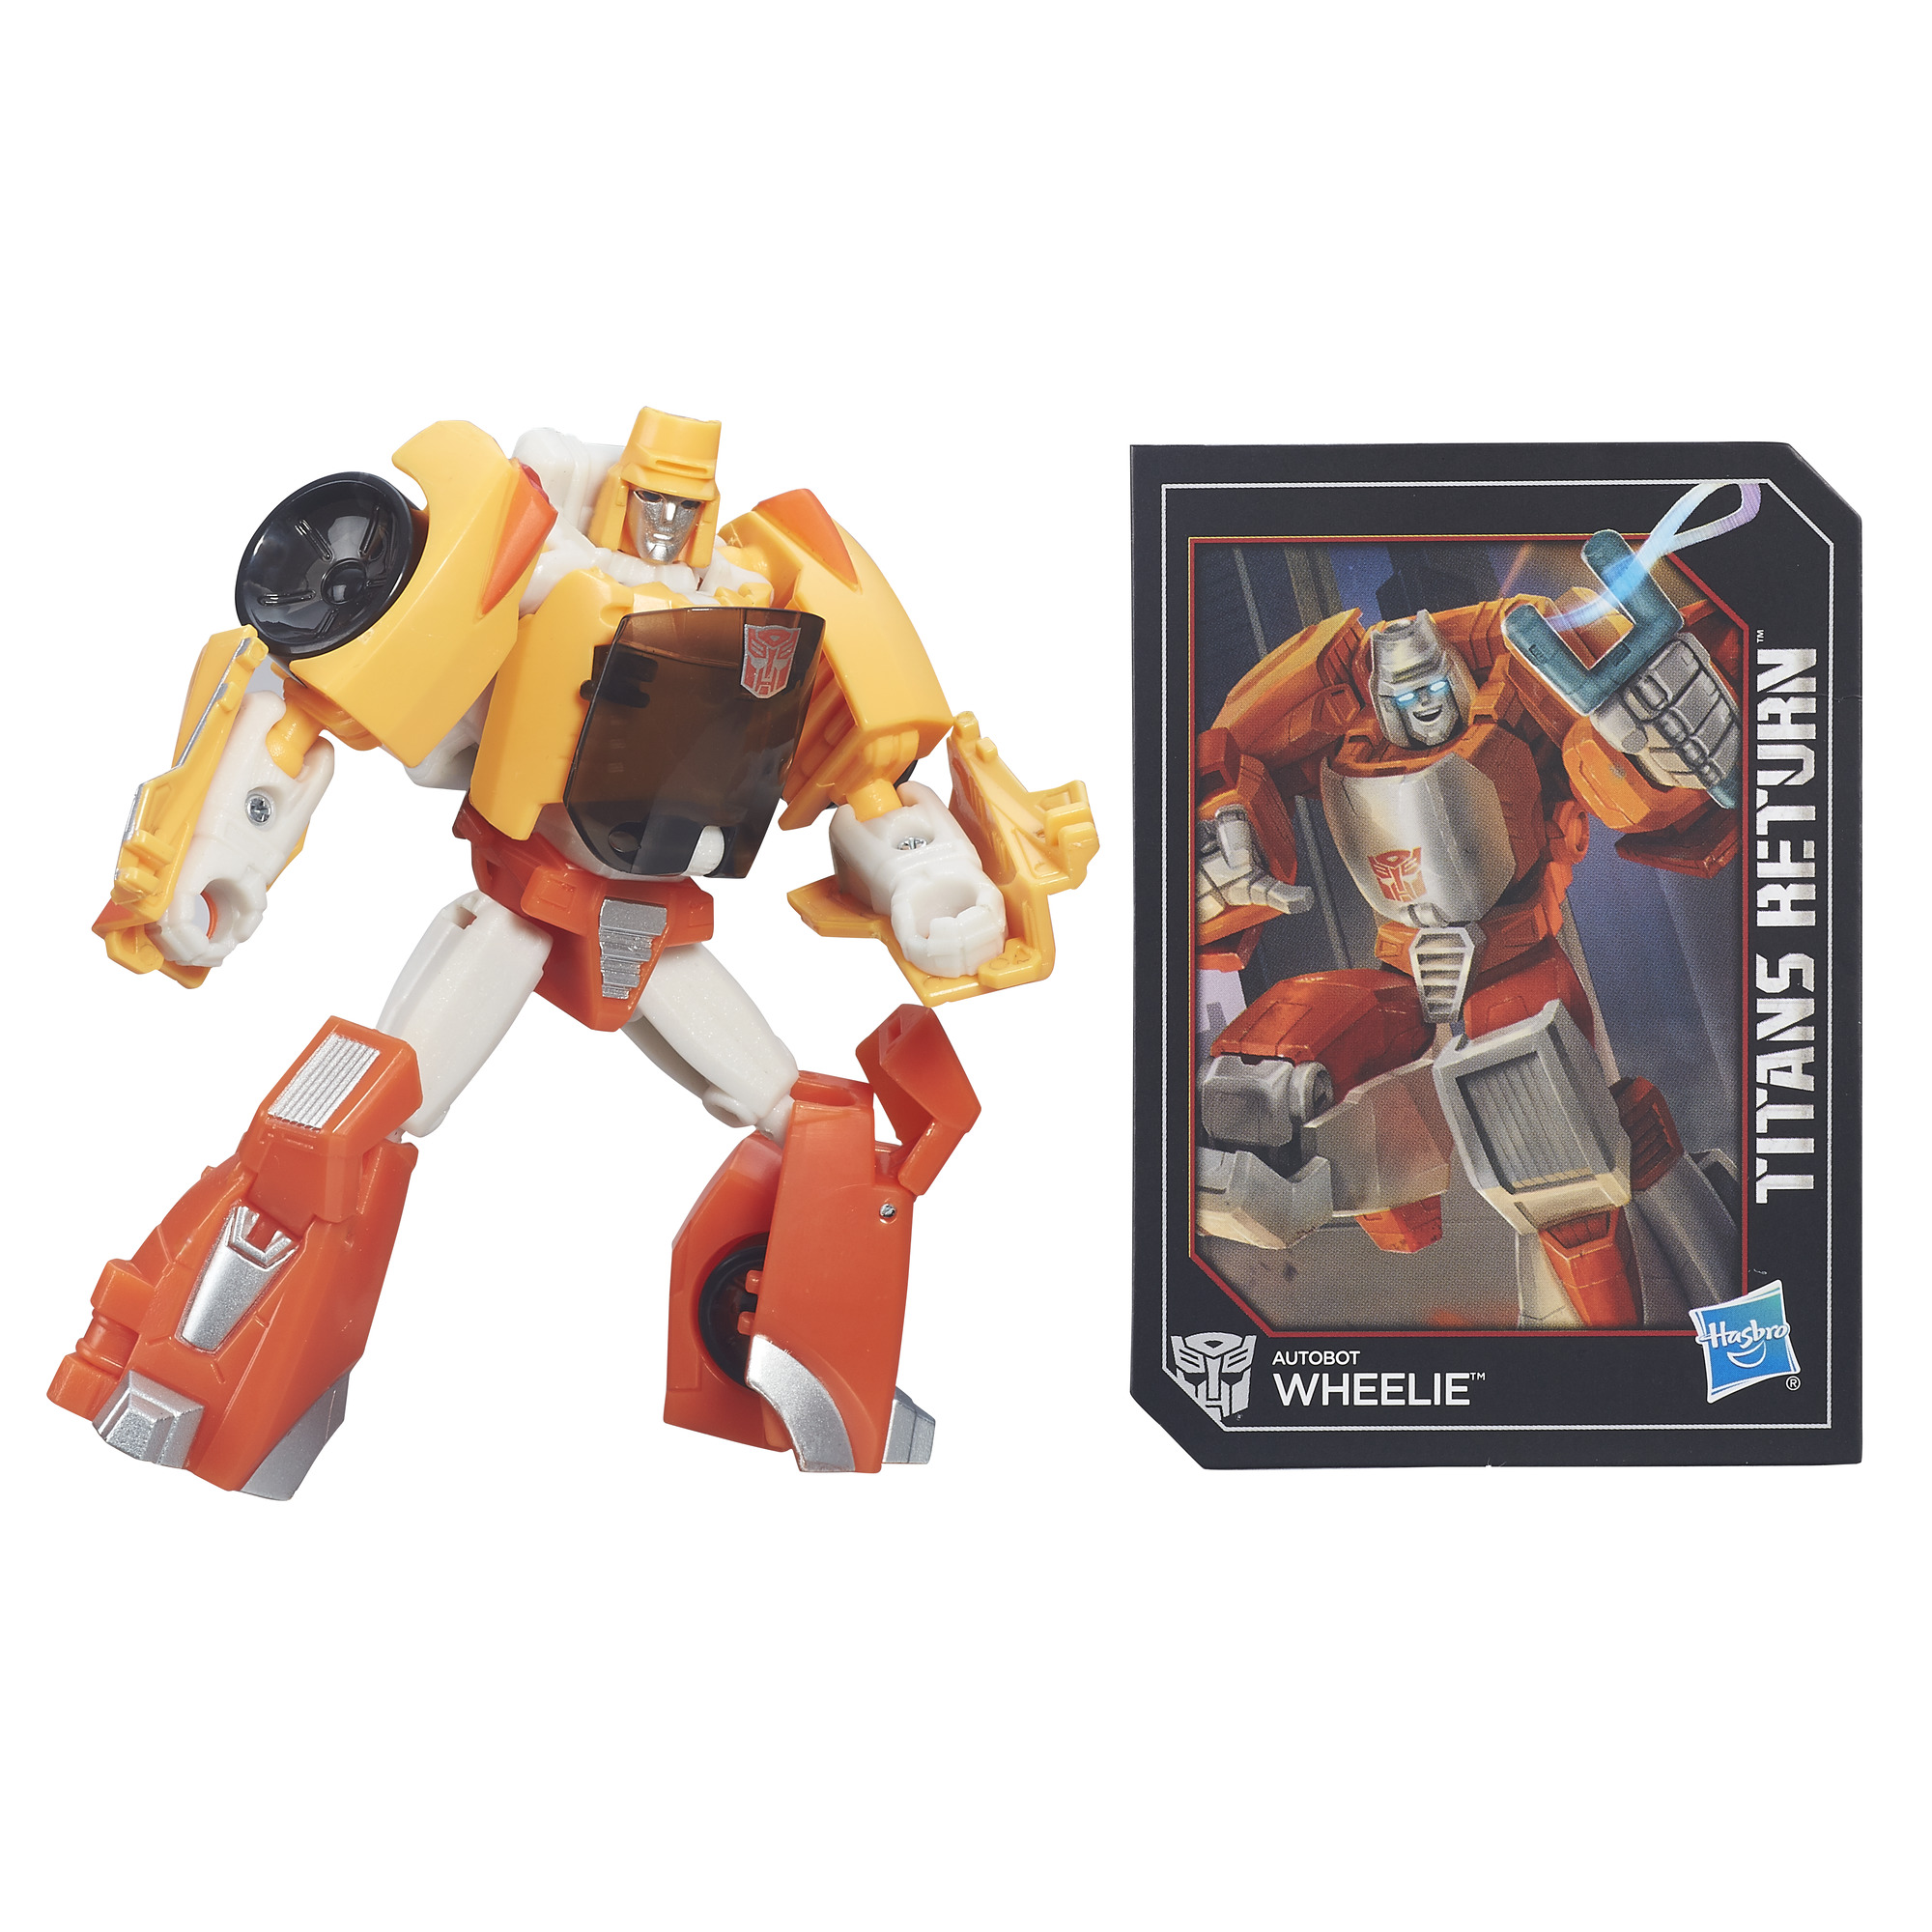 Transformers Titans Return Wheelie Action Figure